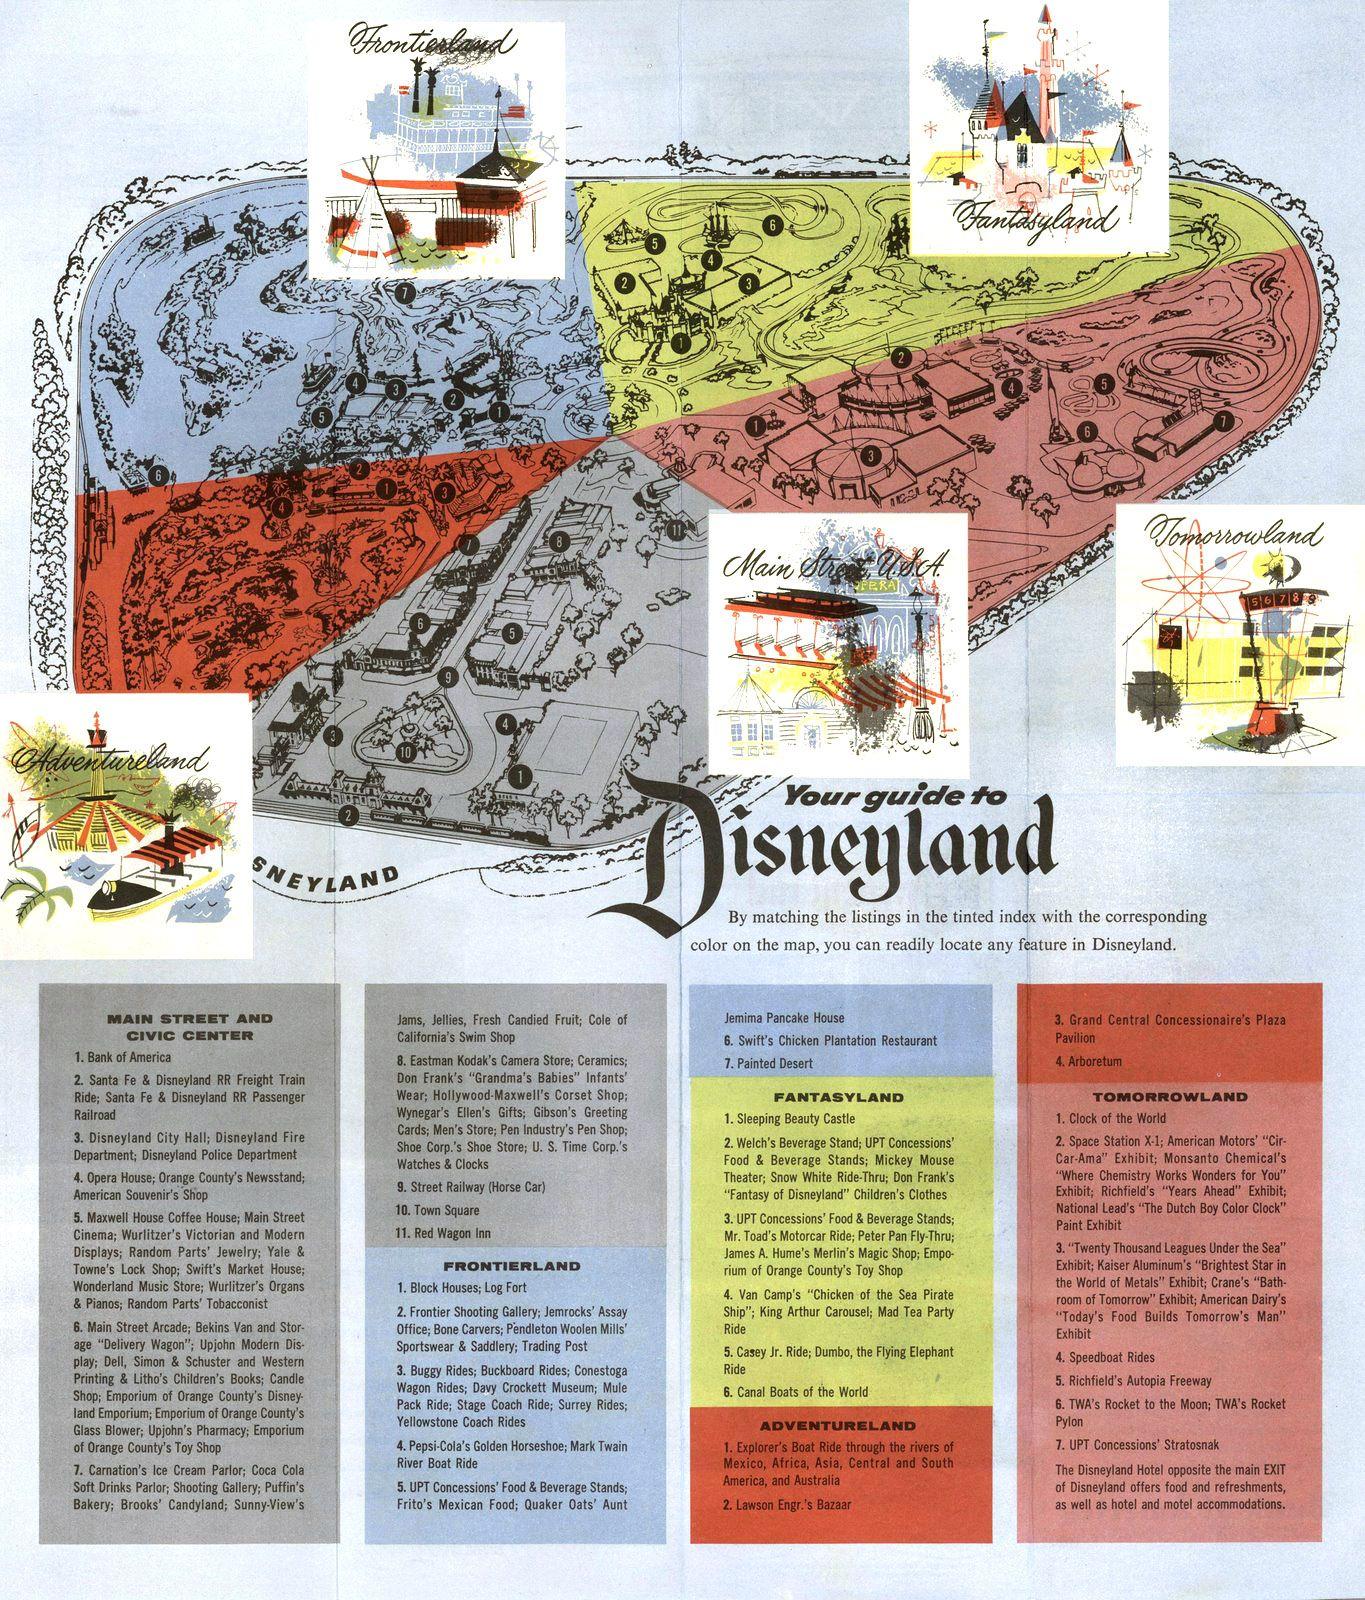 RARE 1957 Bank of America Your Guide to Disneyland Amusement Park Brochure /& Map